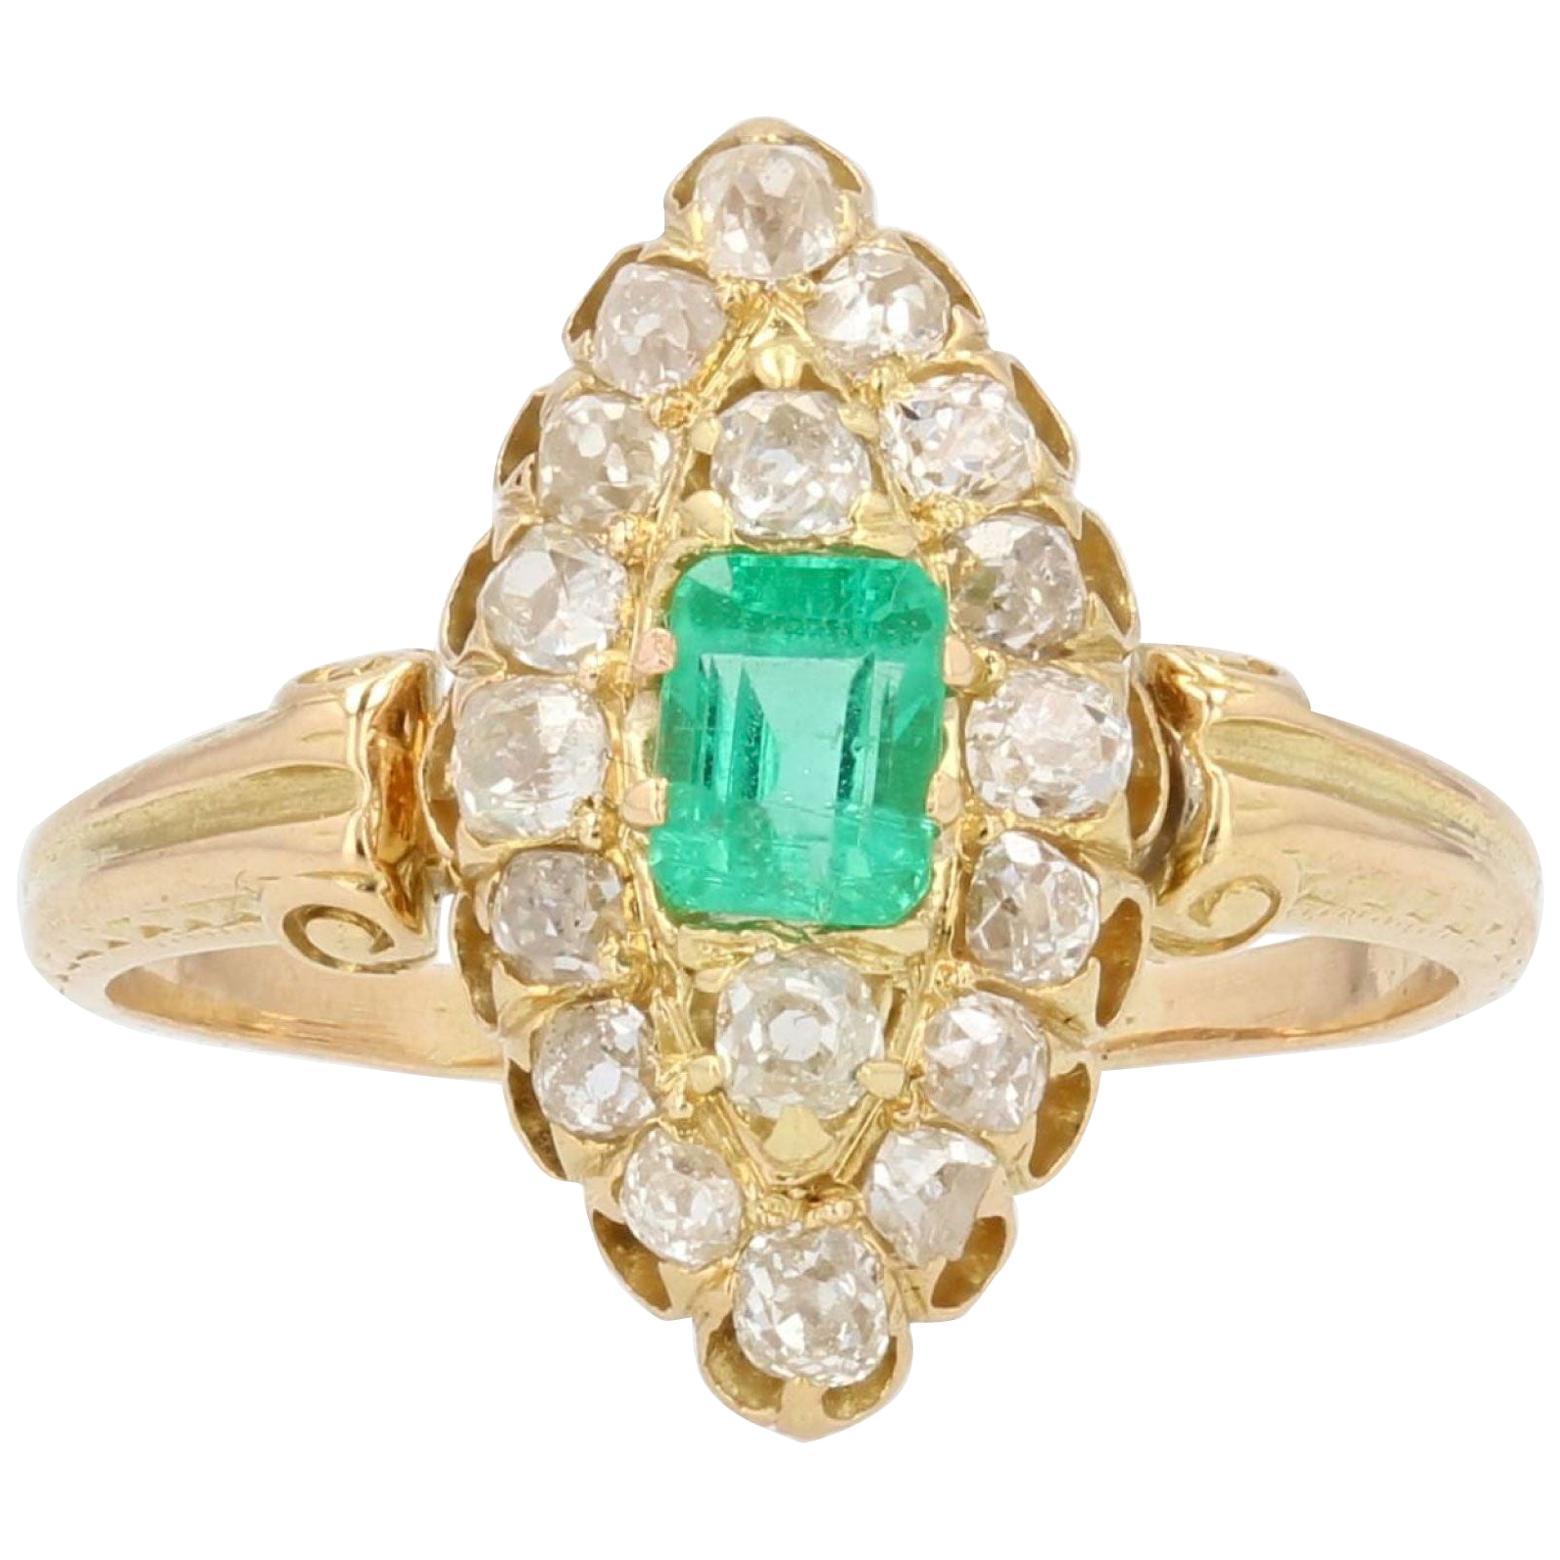 19th Century Emerald Diamond 18 Karat Yellow Gold Marquise Ring